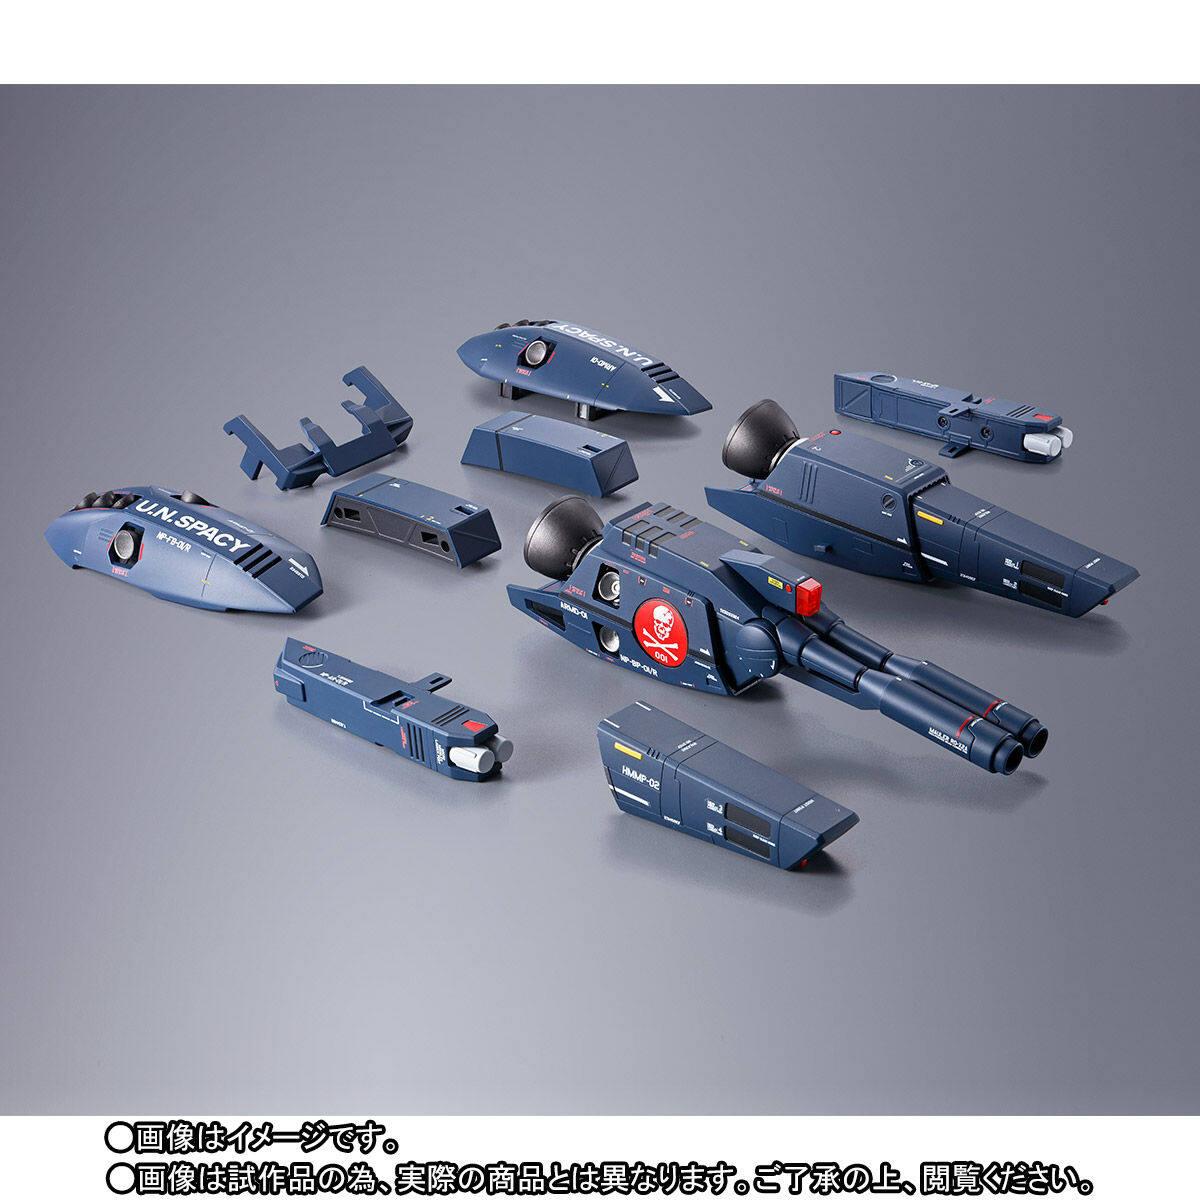 Premium BANDAI DX Chogokin Missile Set for VF-1 Macross w// Tracking NEW